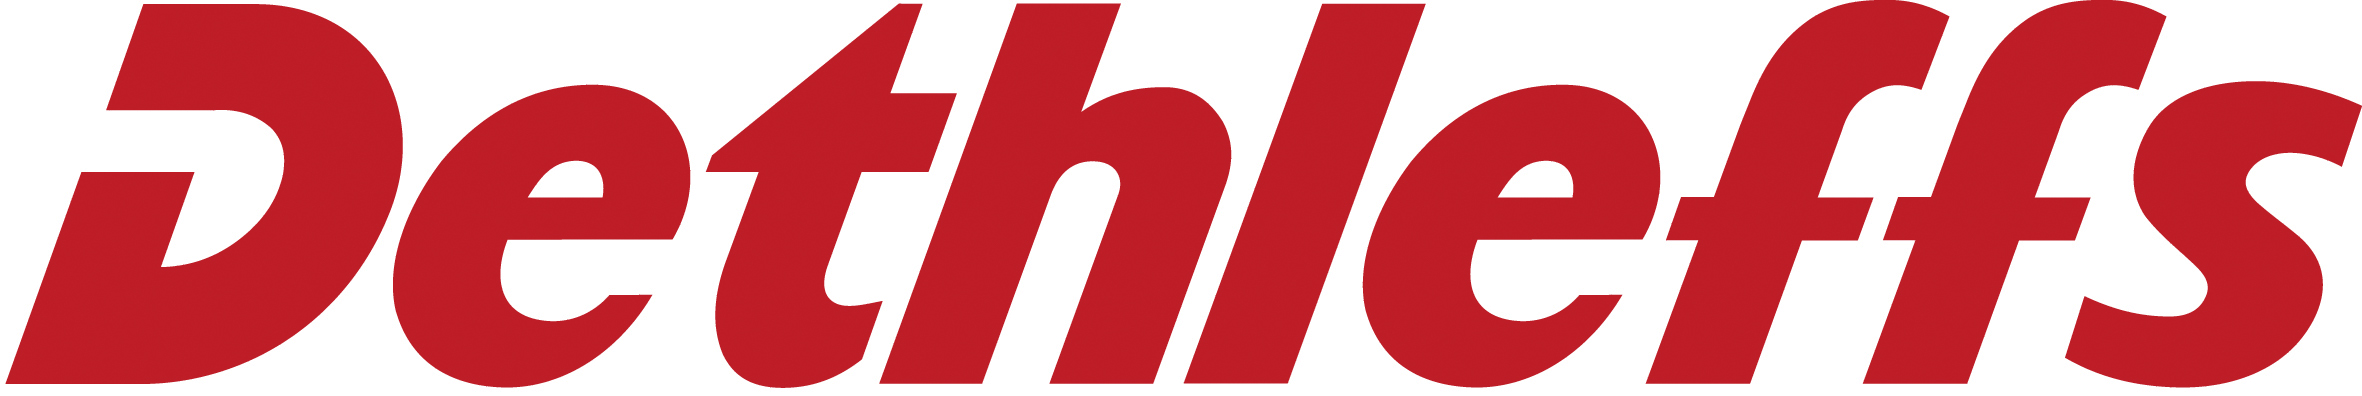 Logo Dethleffs - Wohnmobile mieten